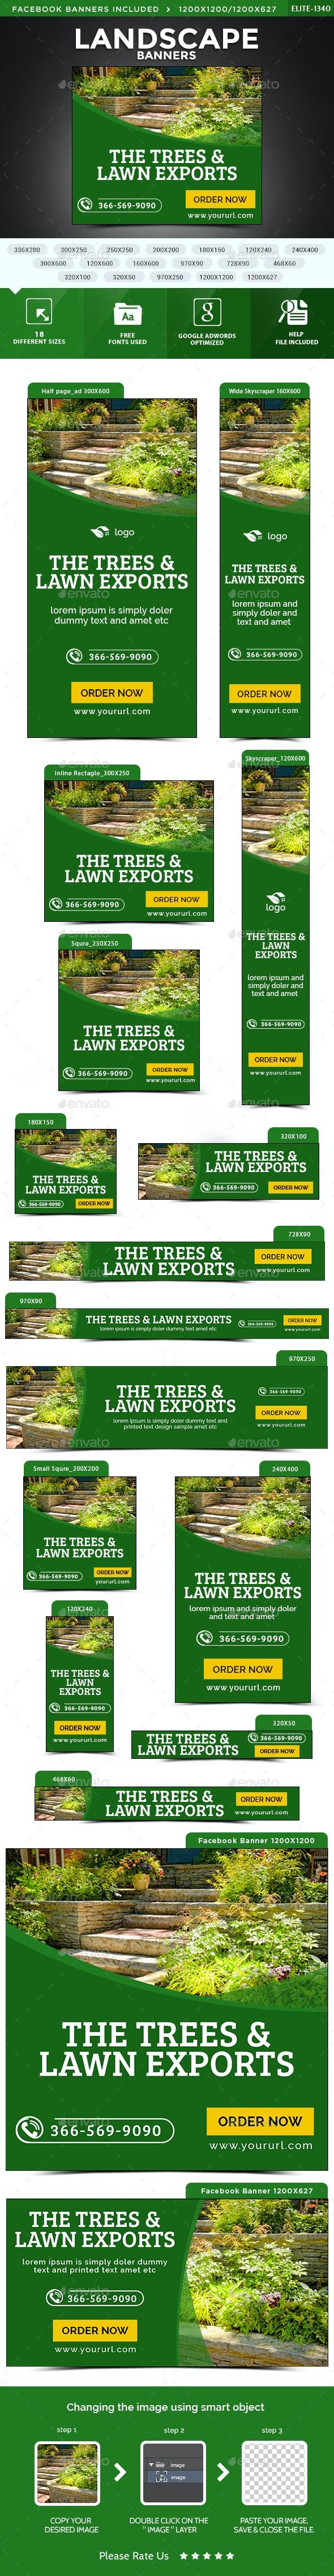 Landscape Banners - Banners & Ads Web Elements